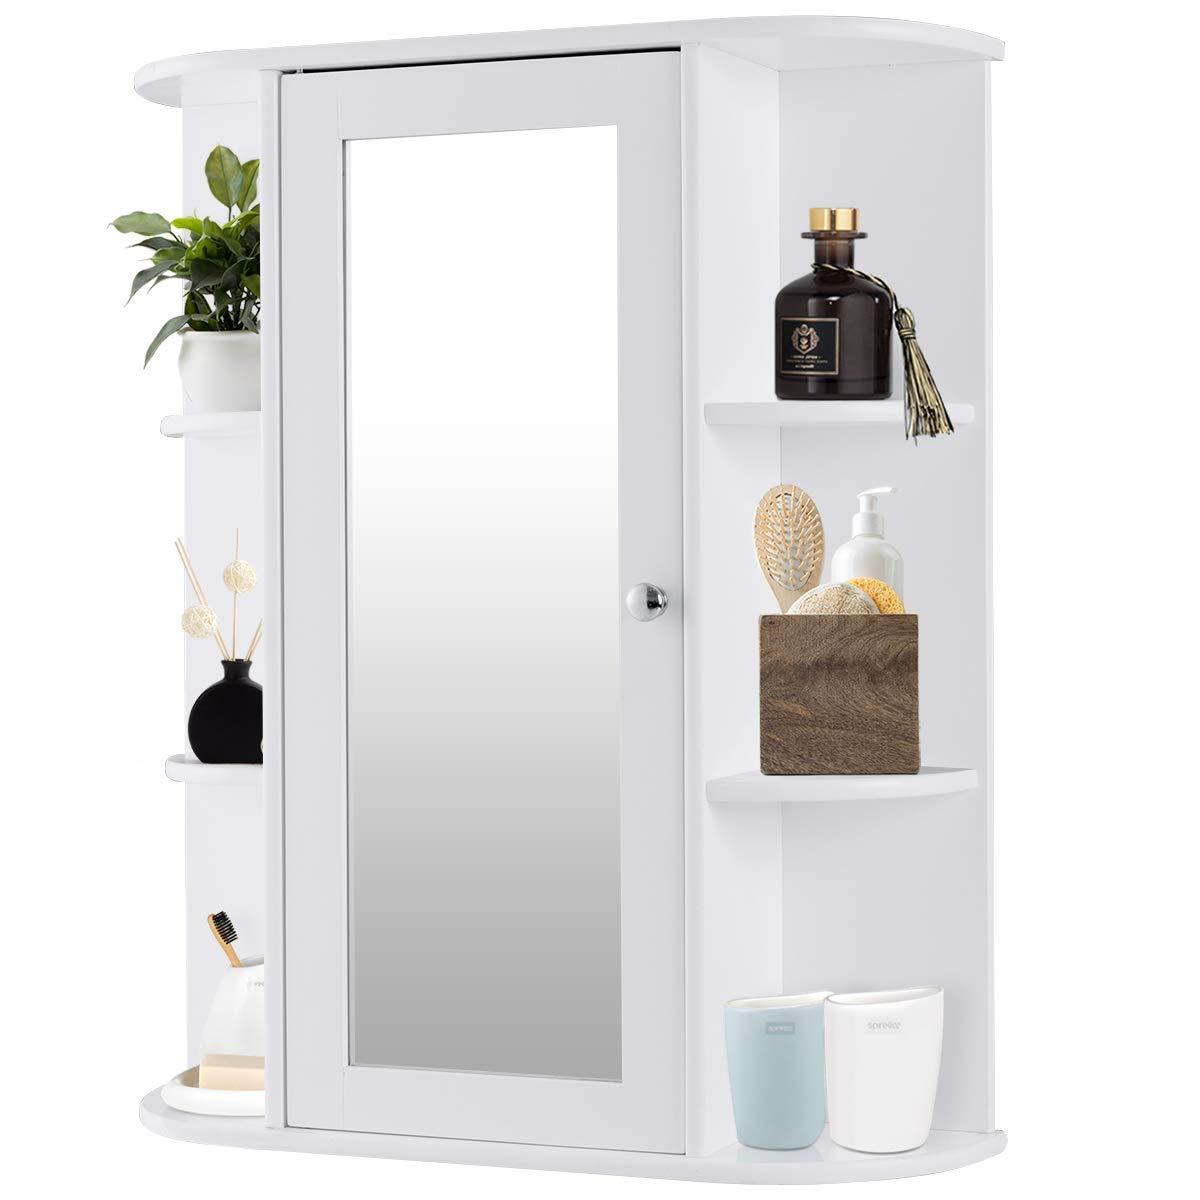 Tangkula Bathroom Cabinet Single Door Wall Mount with Mirror Organizer Storage Cabinet(2 Tier Inner Shelves)